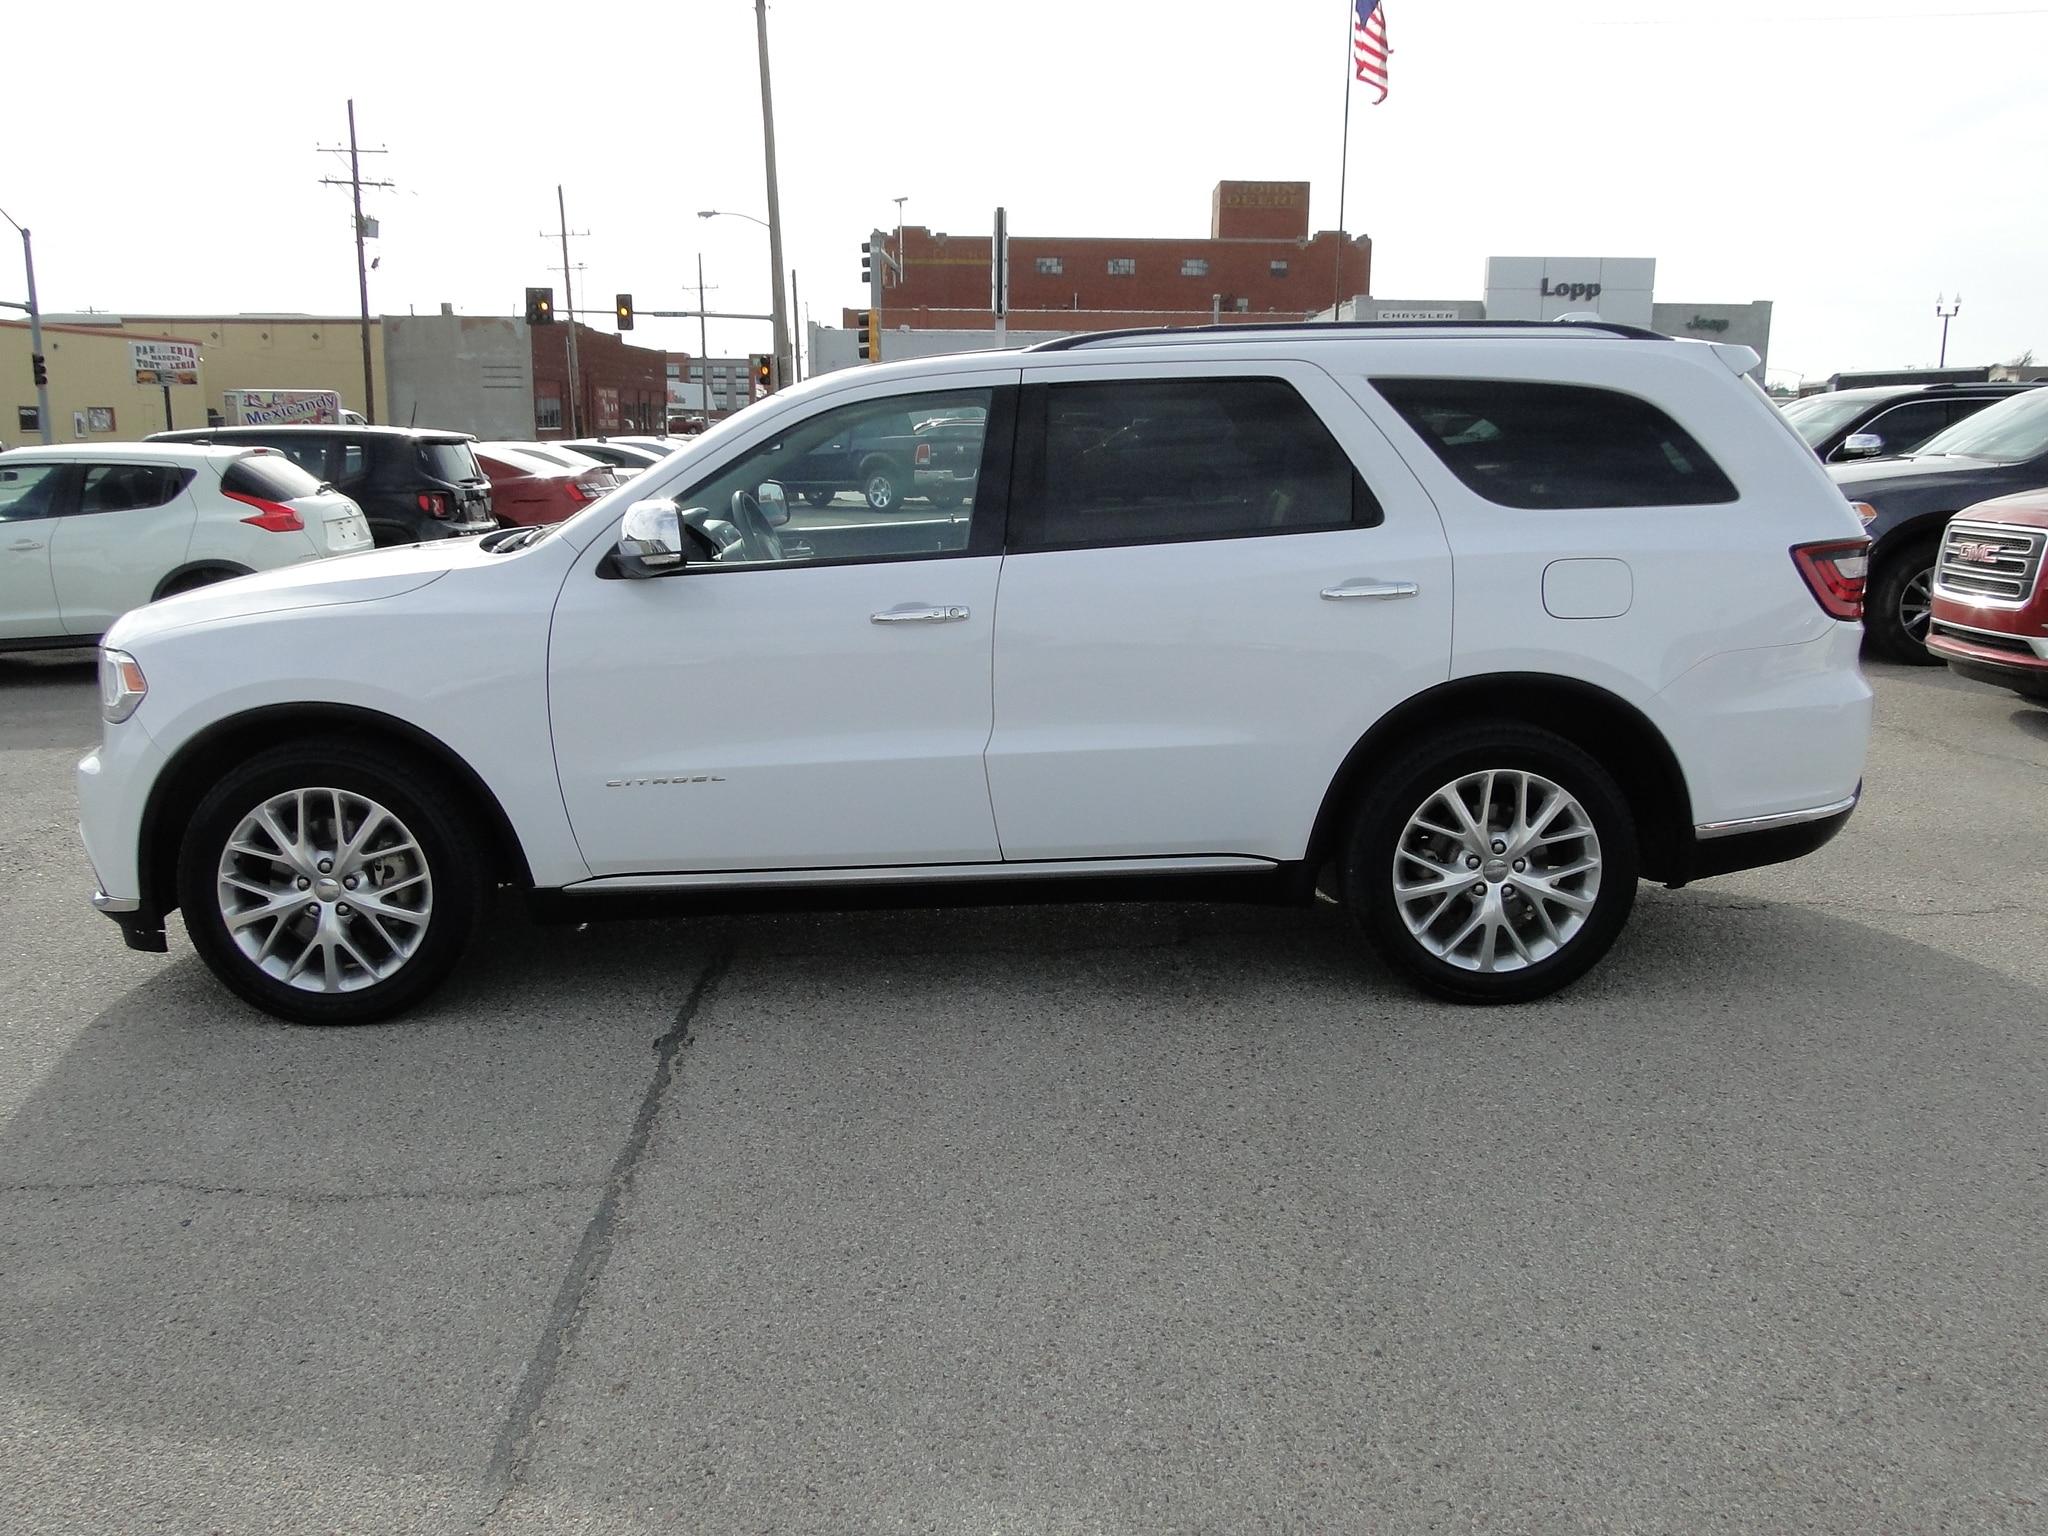 2014 Dodge Durango Citadel SUV